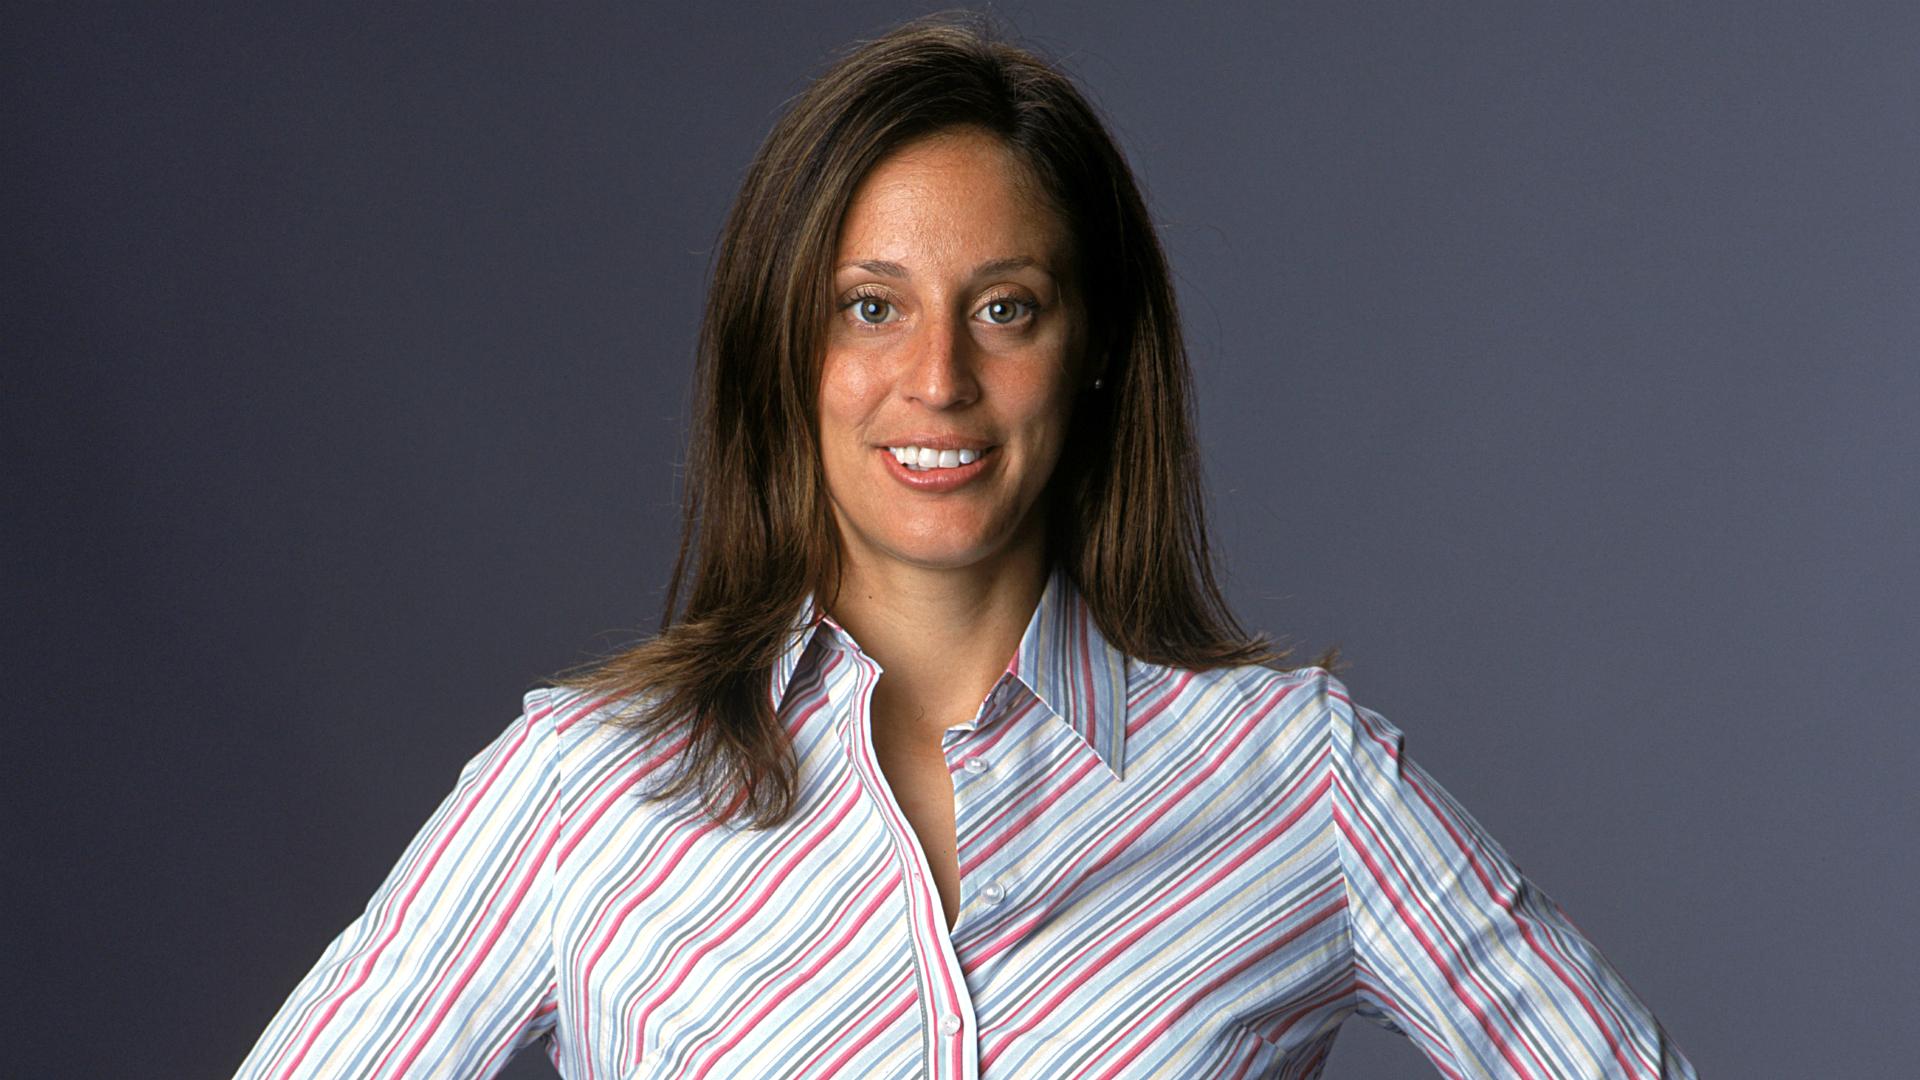 Kate Markgraf